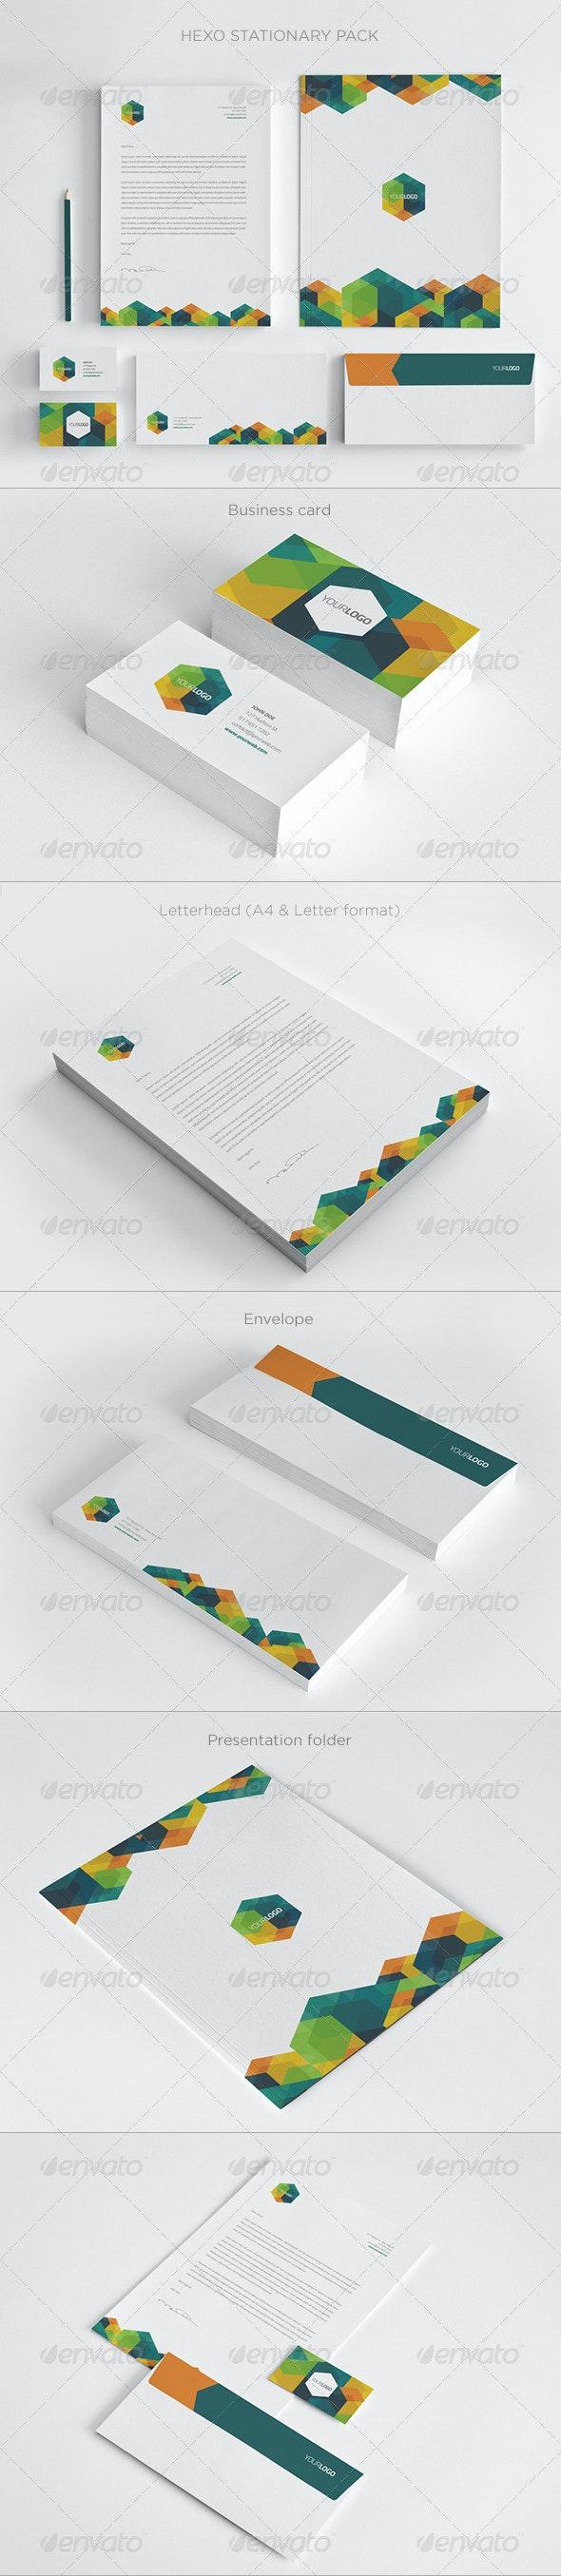 Modern Hexo Stationary Pack - Stationery Print Templates